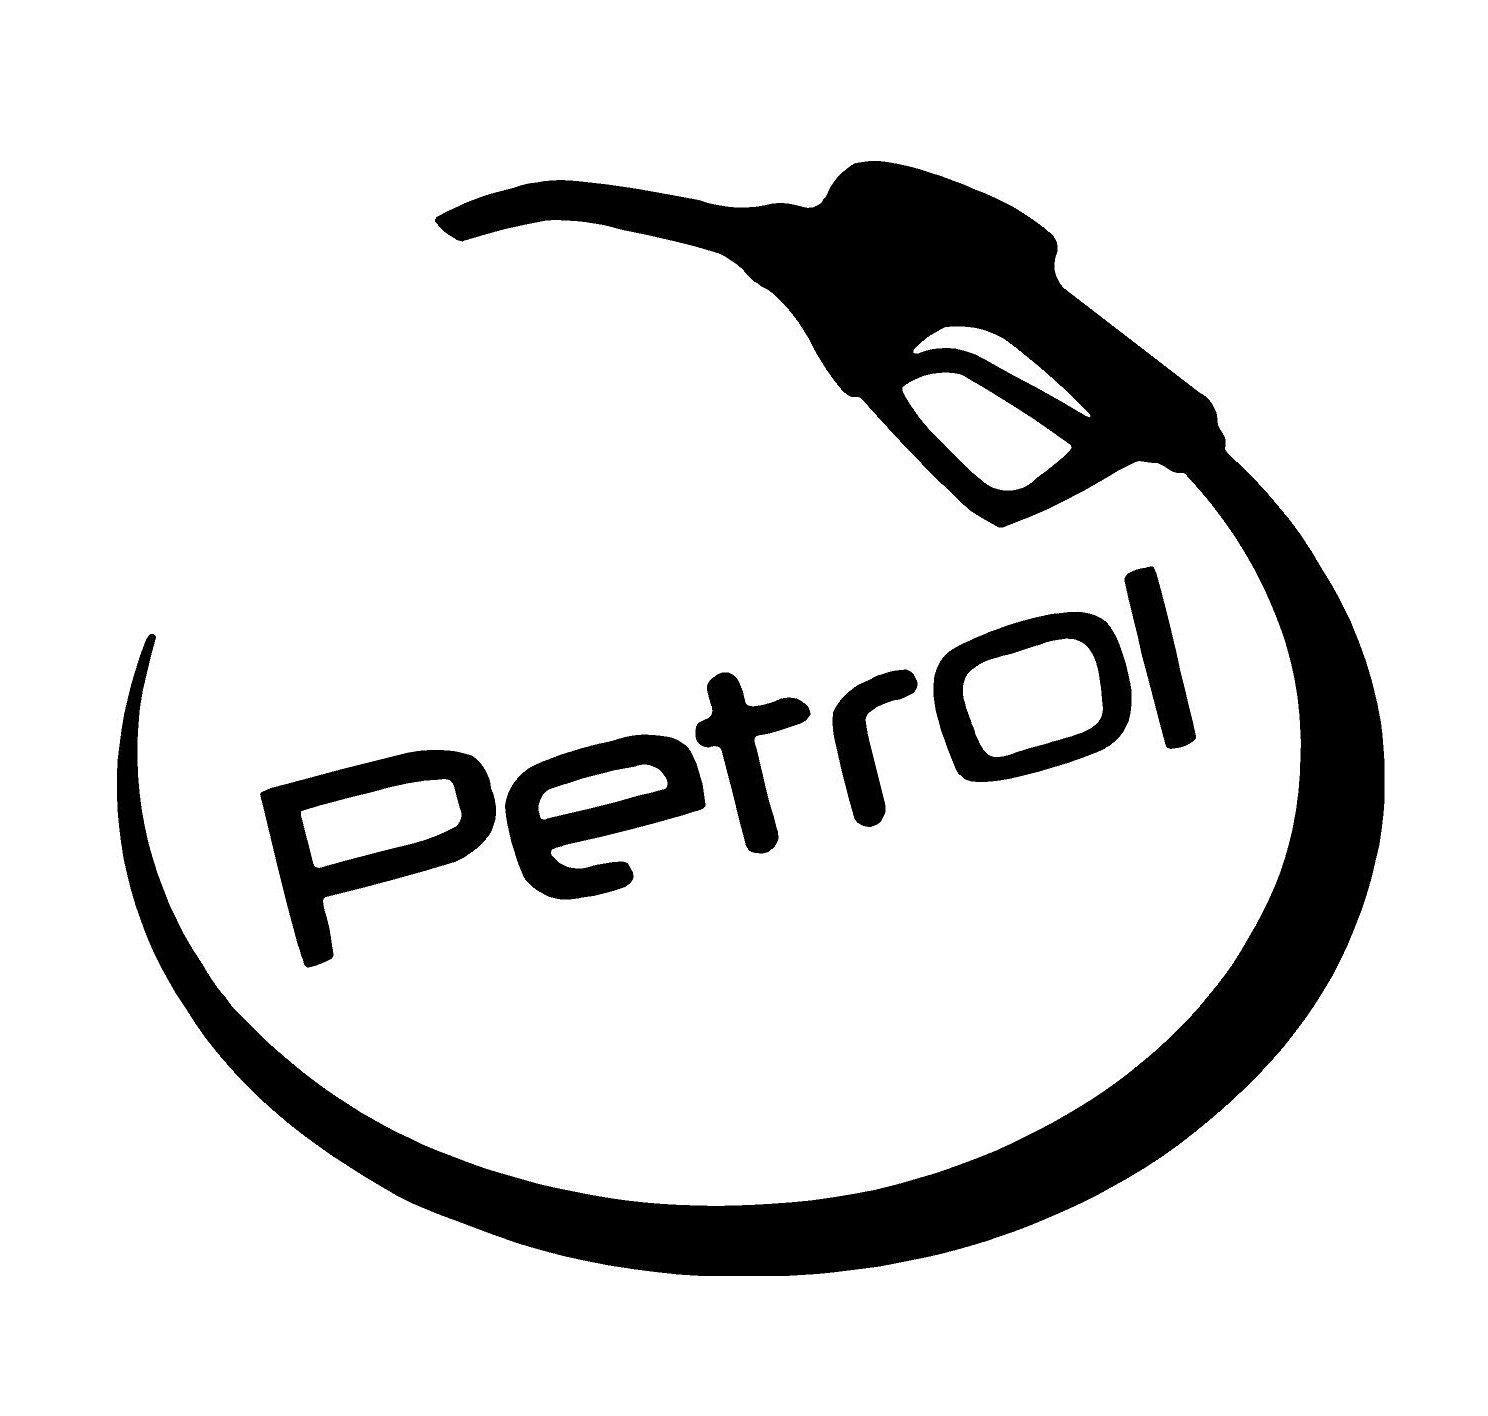 Cvanu petrol fuel lid side car sticker for maruti suzuki ignis p 9 black amazon in car motorbike